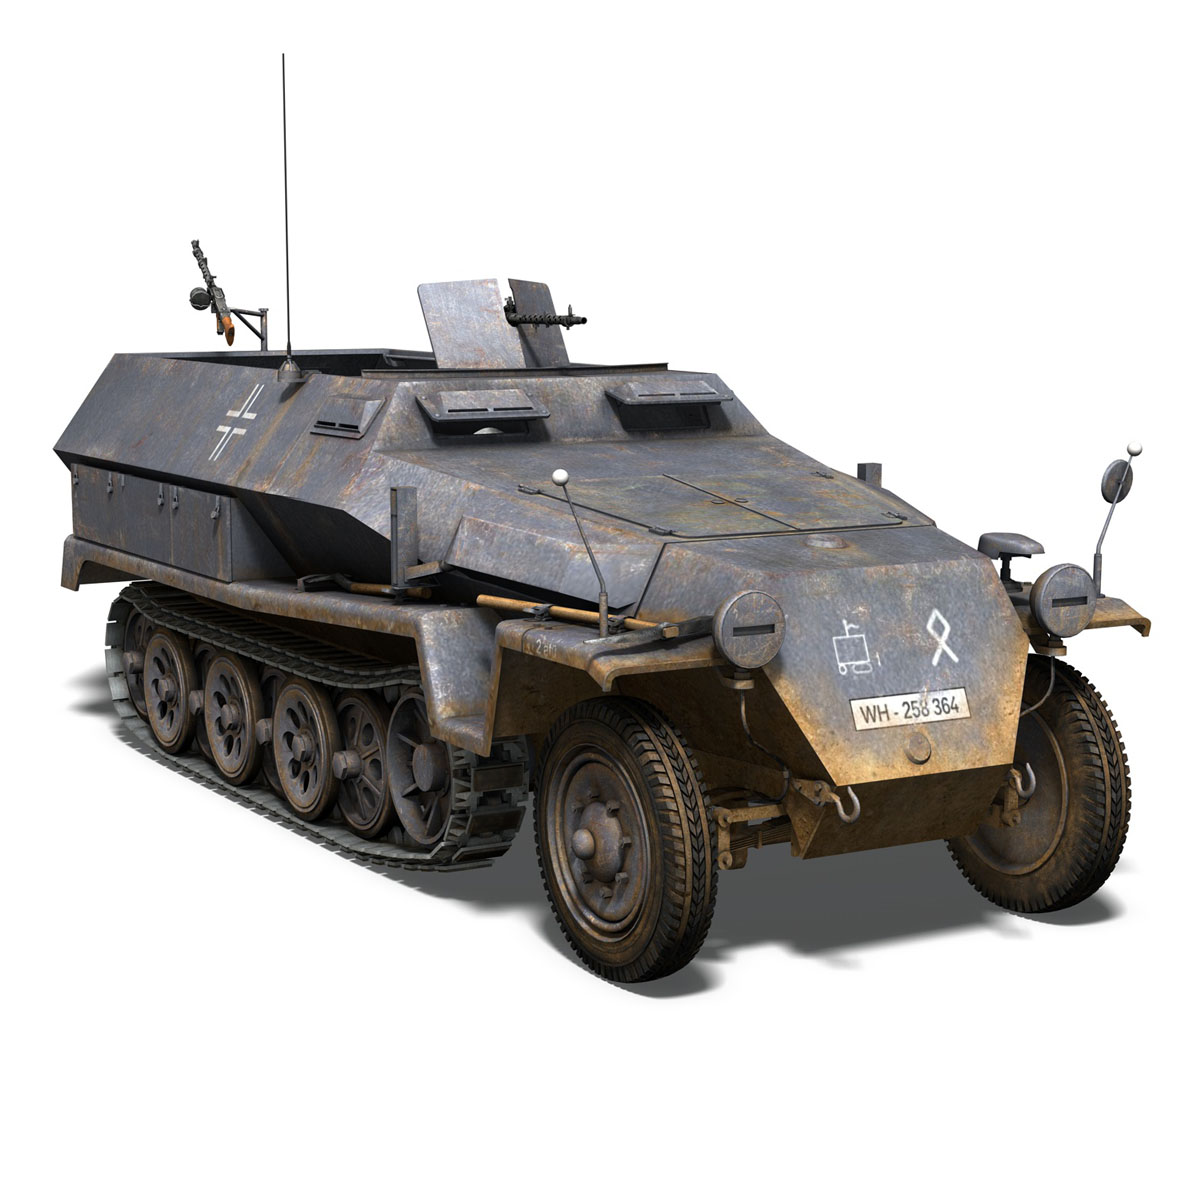 sd.kfz 251 1 ausf.c – half-track 3d model 3ds fbx c4d lwo obj 201396